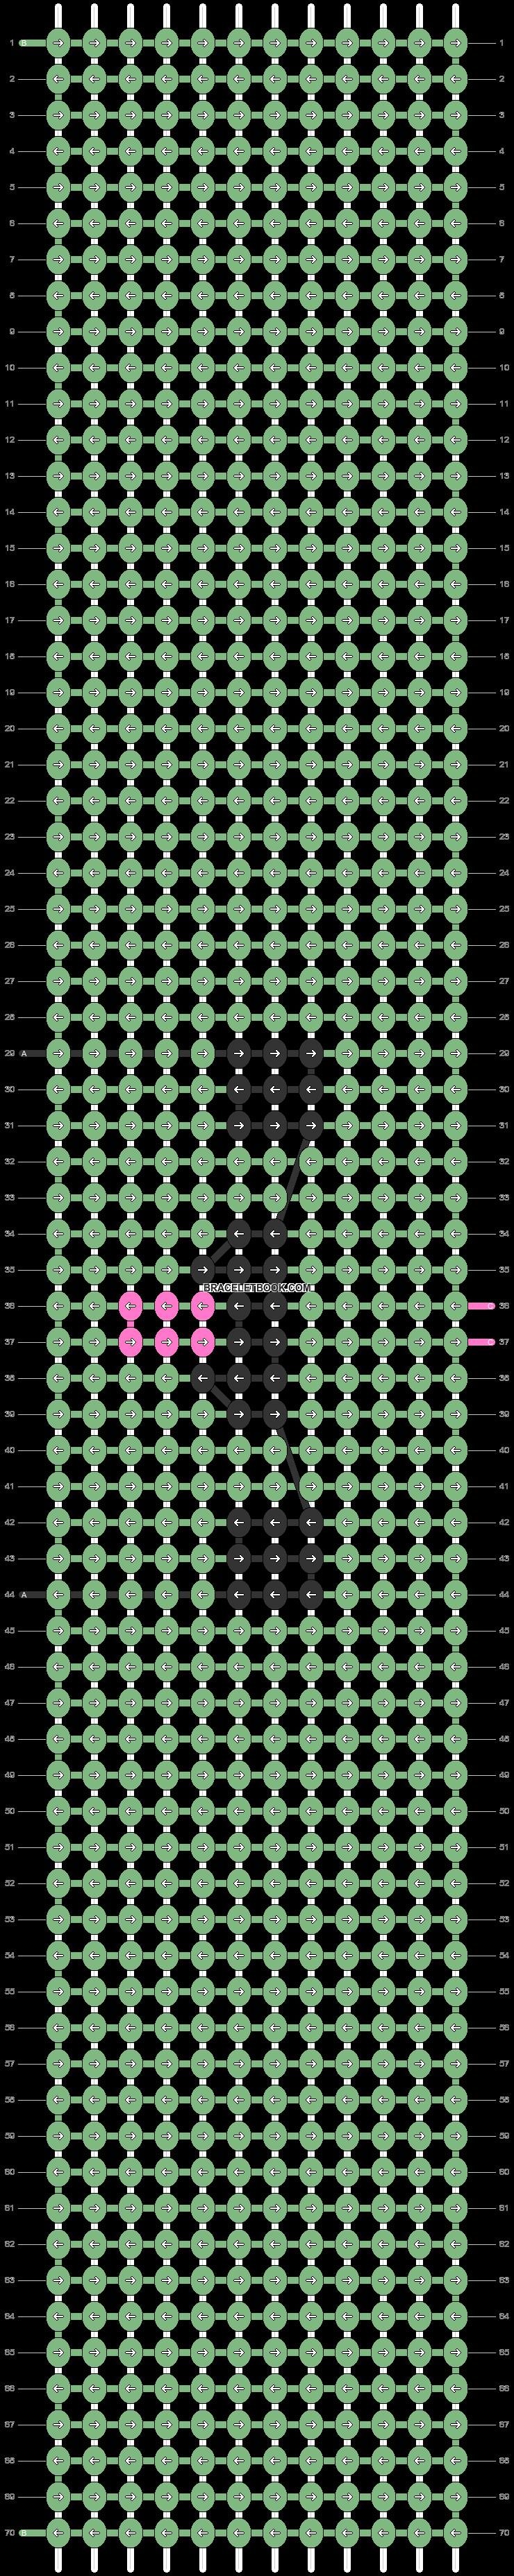 Alpha pattern #45880 variation #121406 pattern